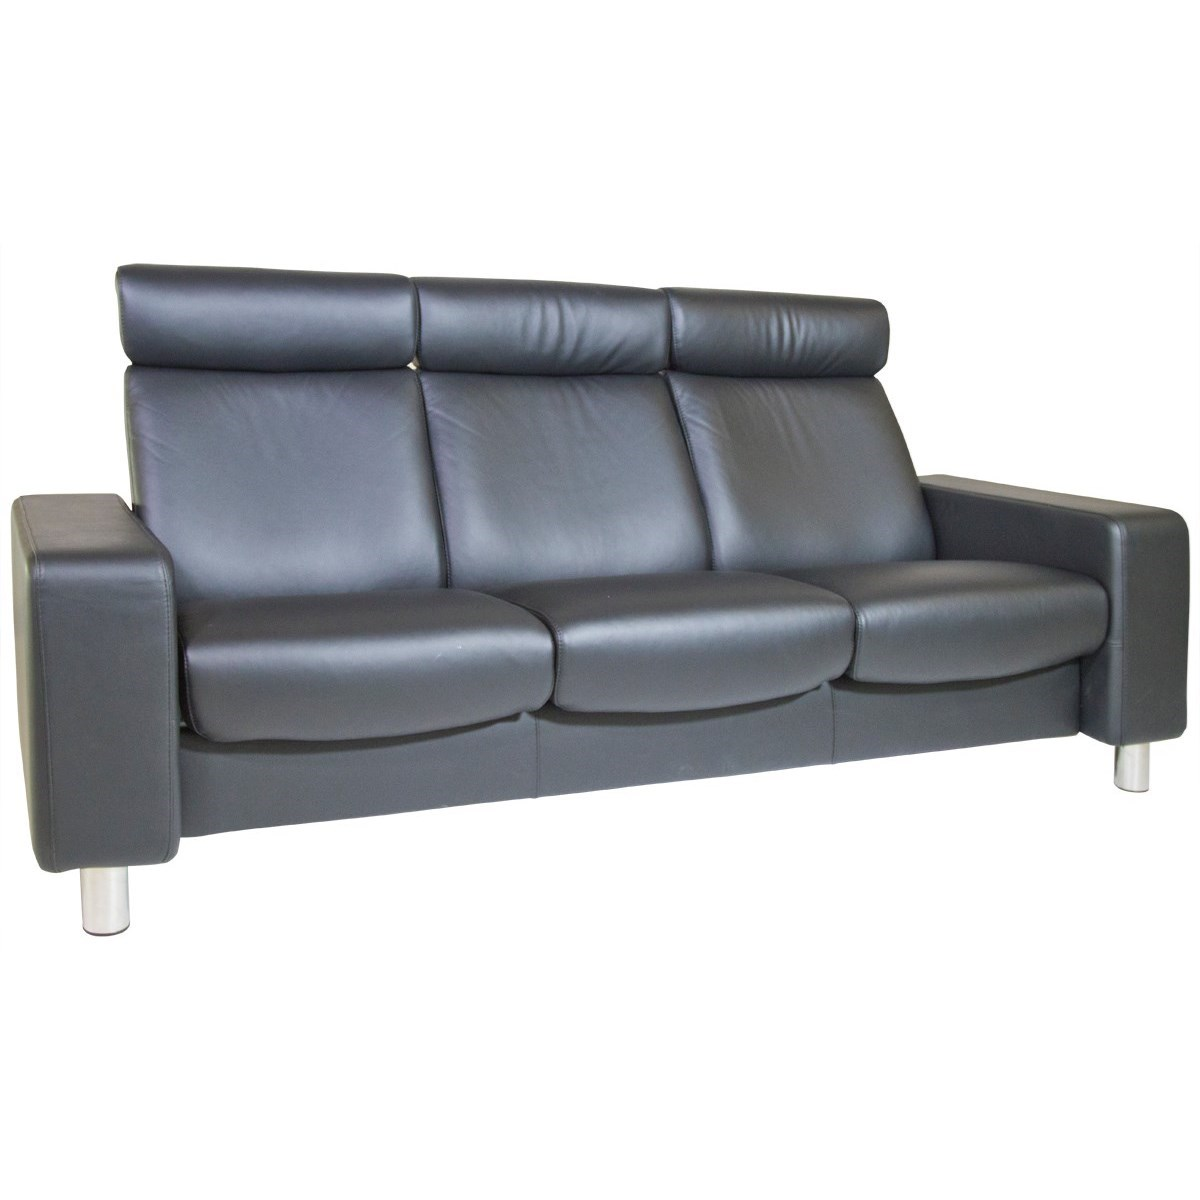 Stressless By Ekornes Stressless Pause Sofa Homeworld Furniture Sofas